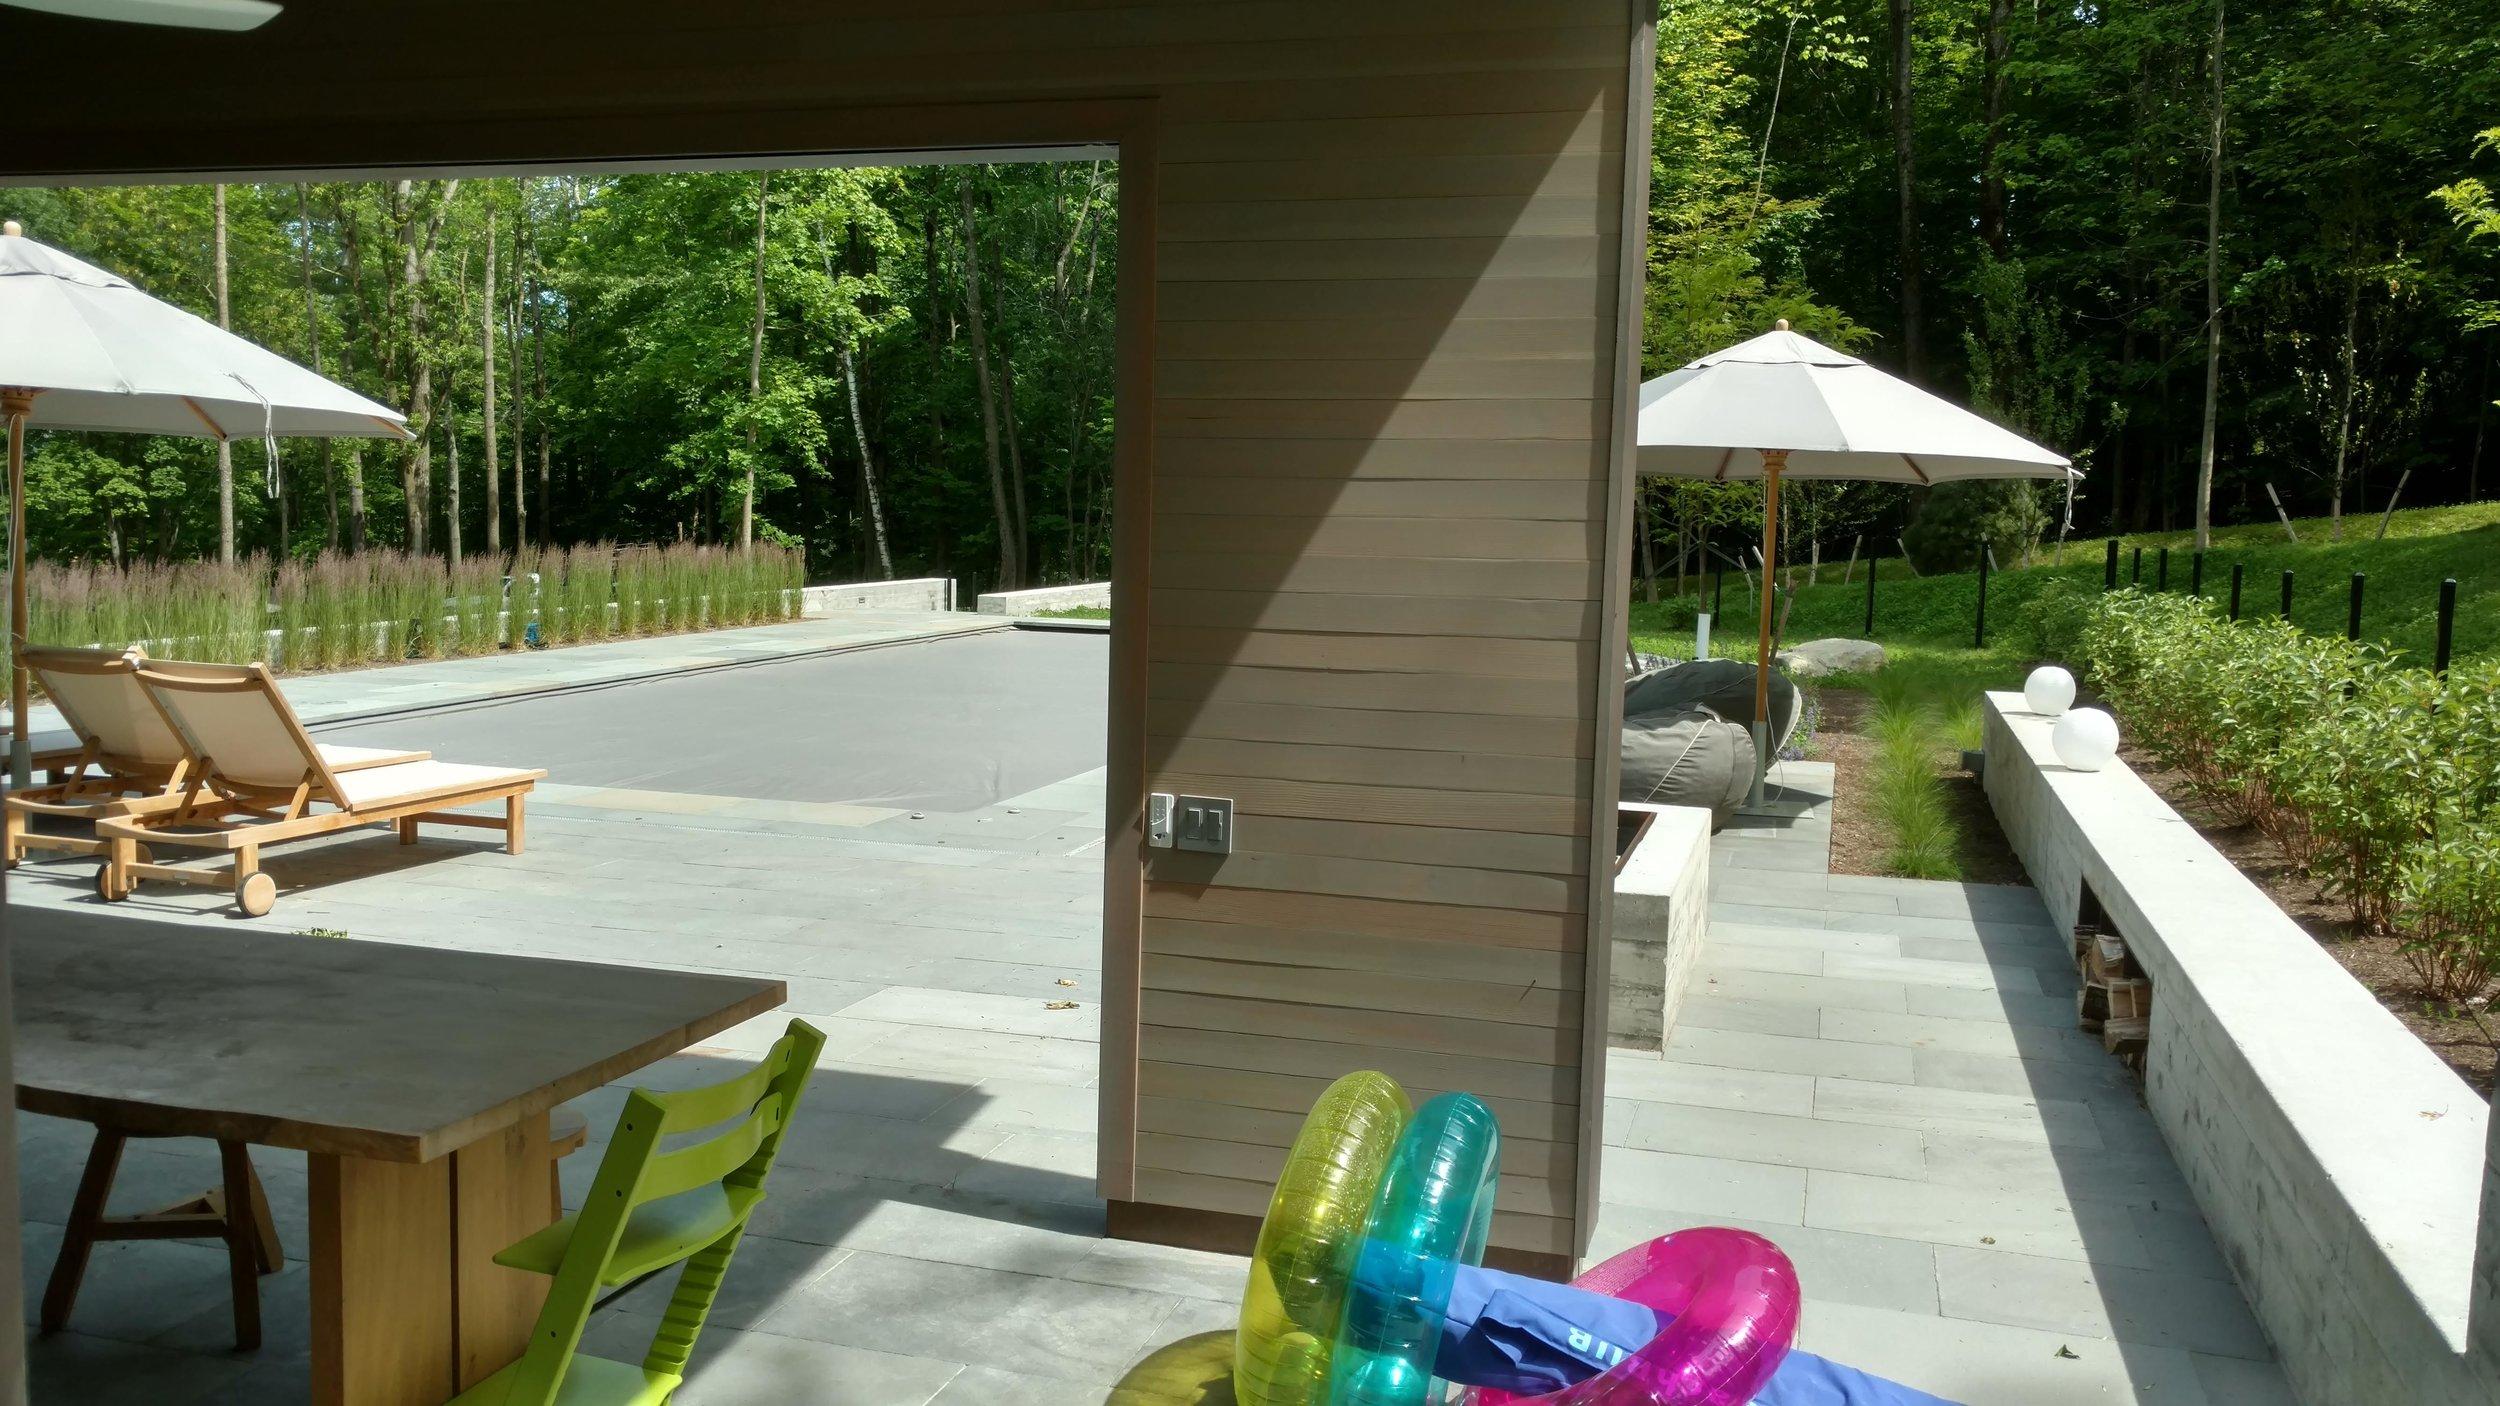 Pool Fence Enclosure